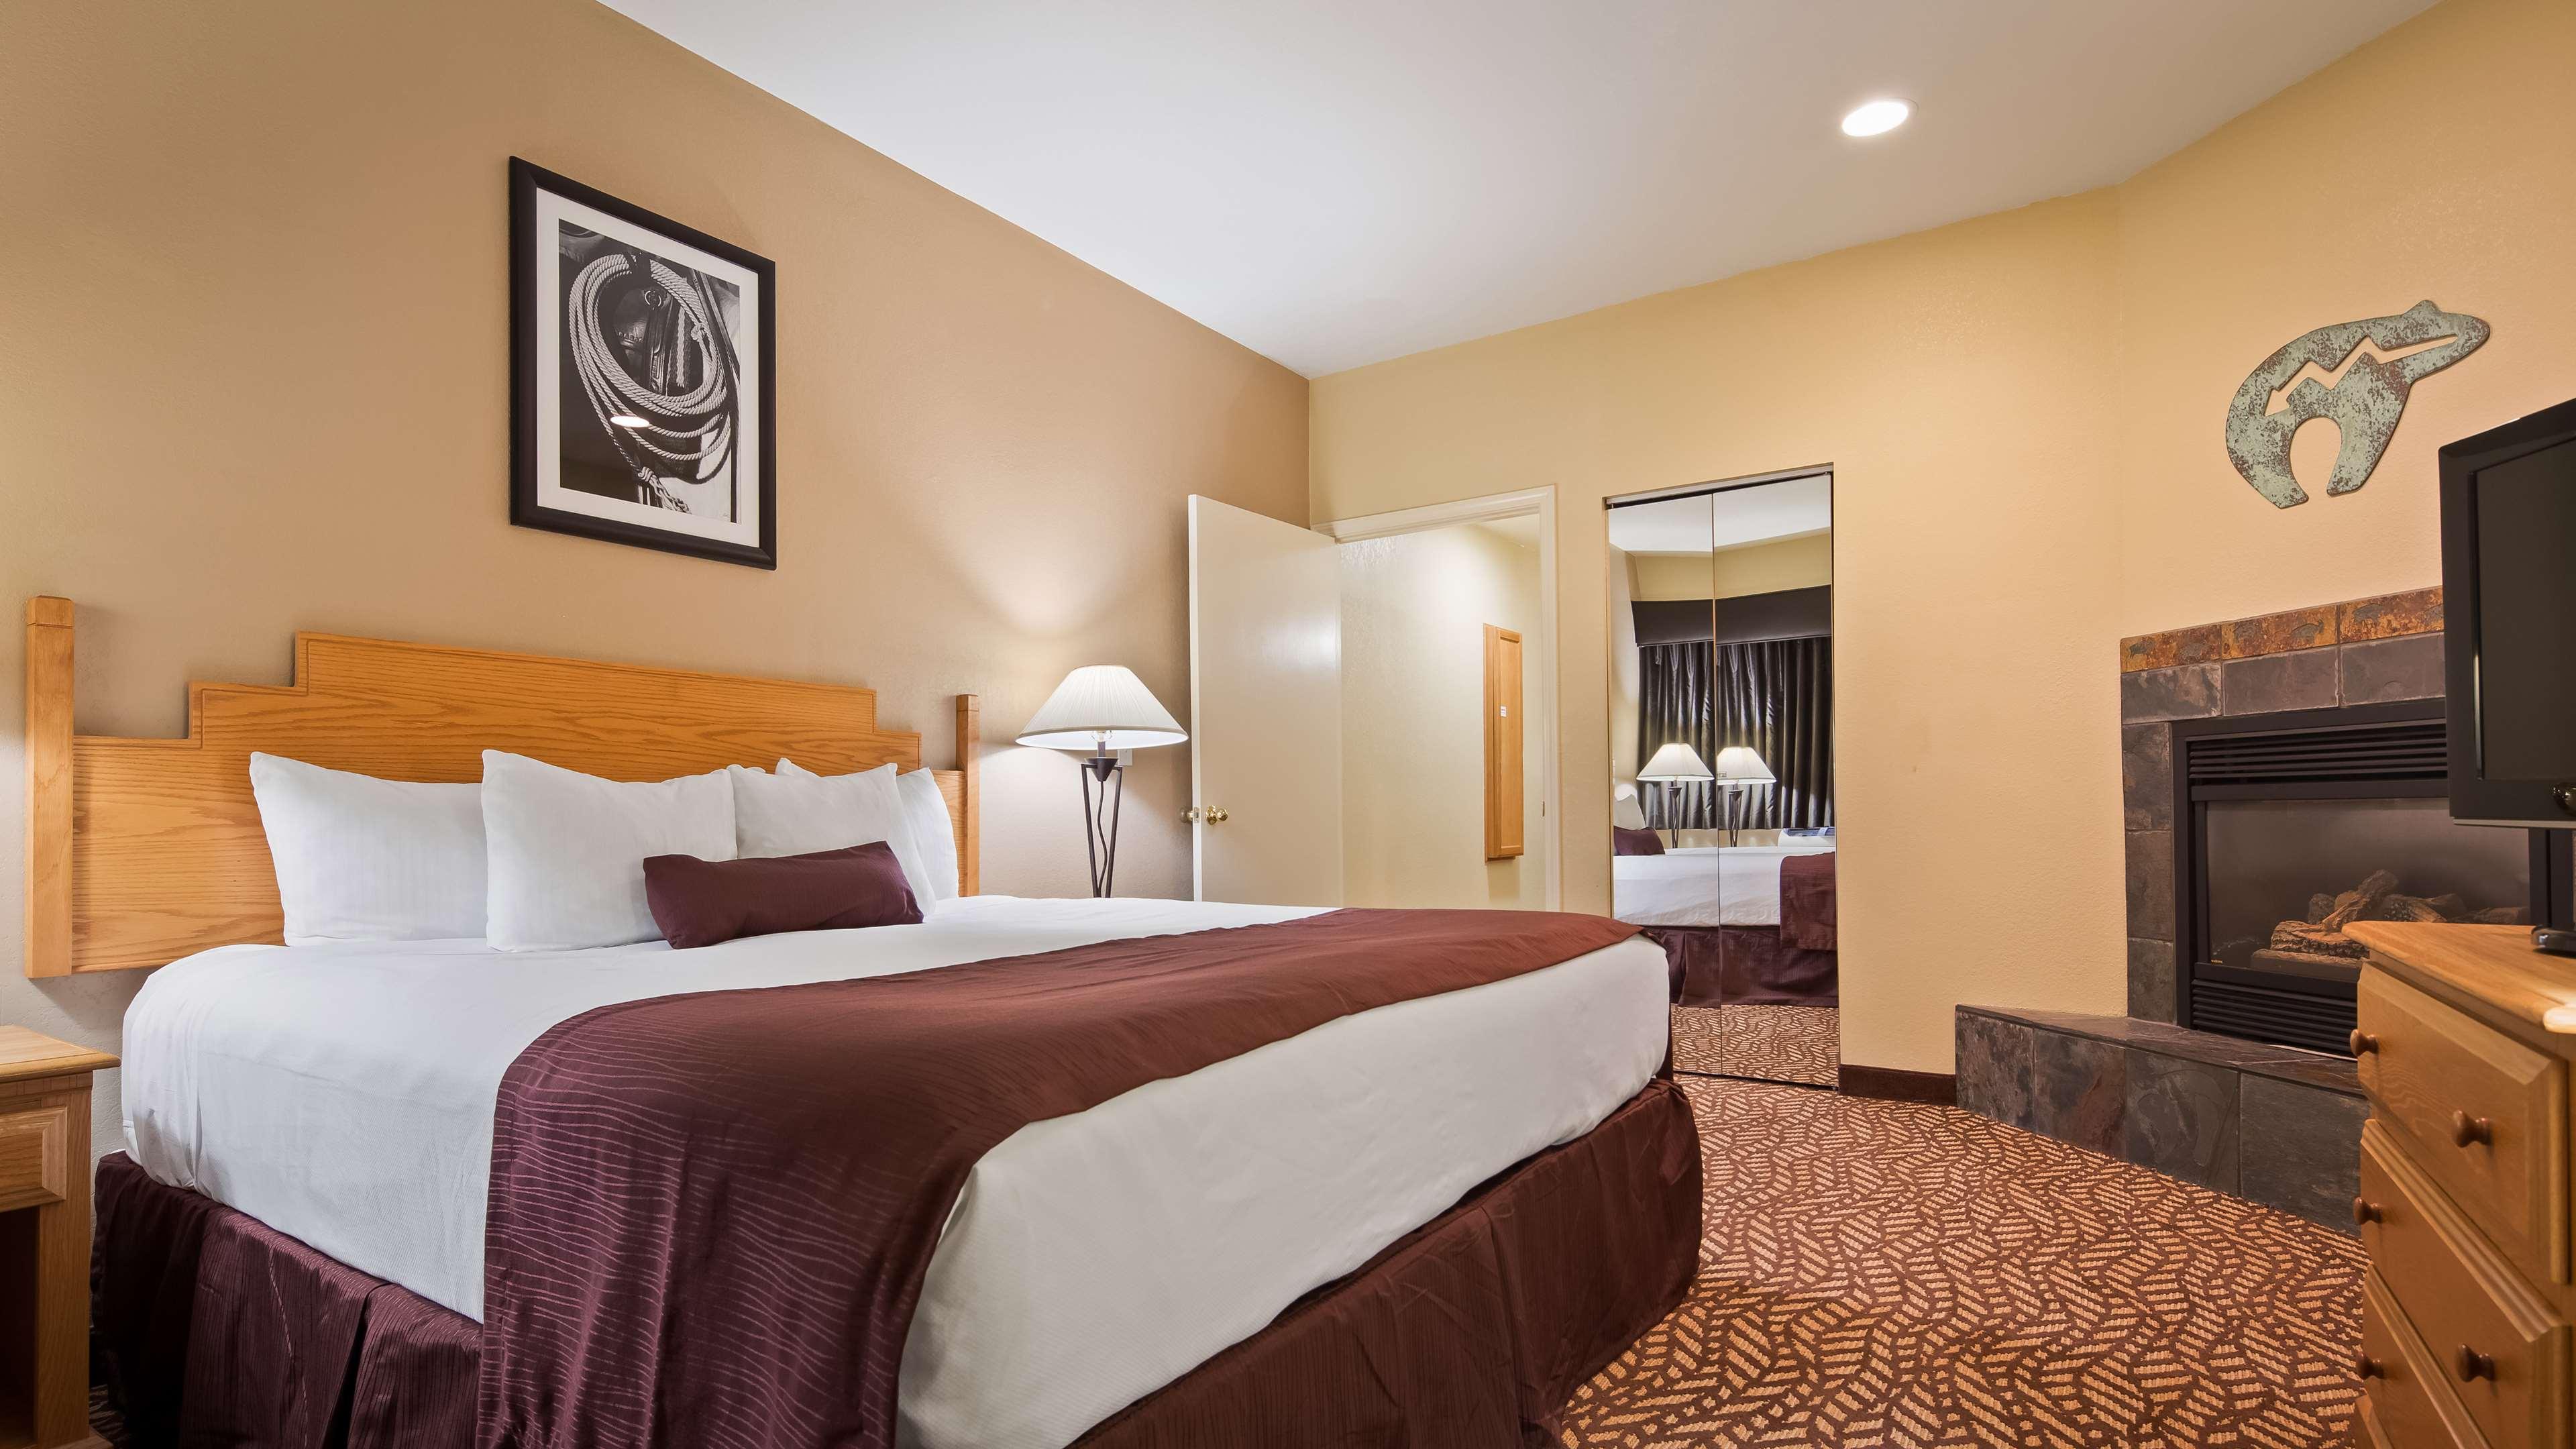 Best Western Turquoise Inn & Suites image 20